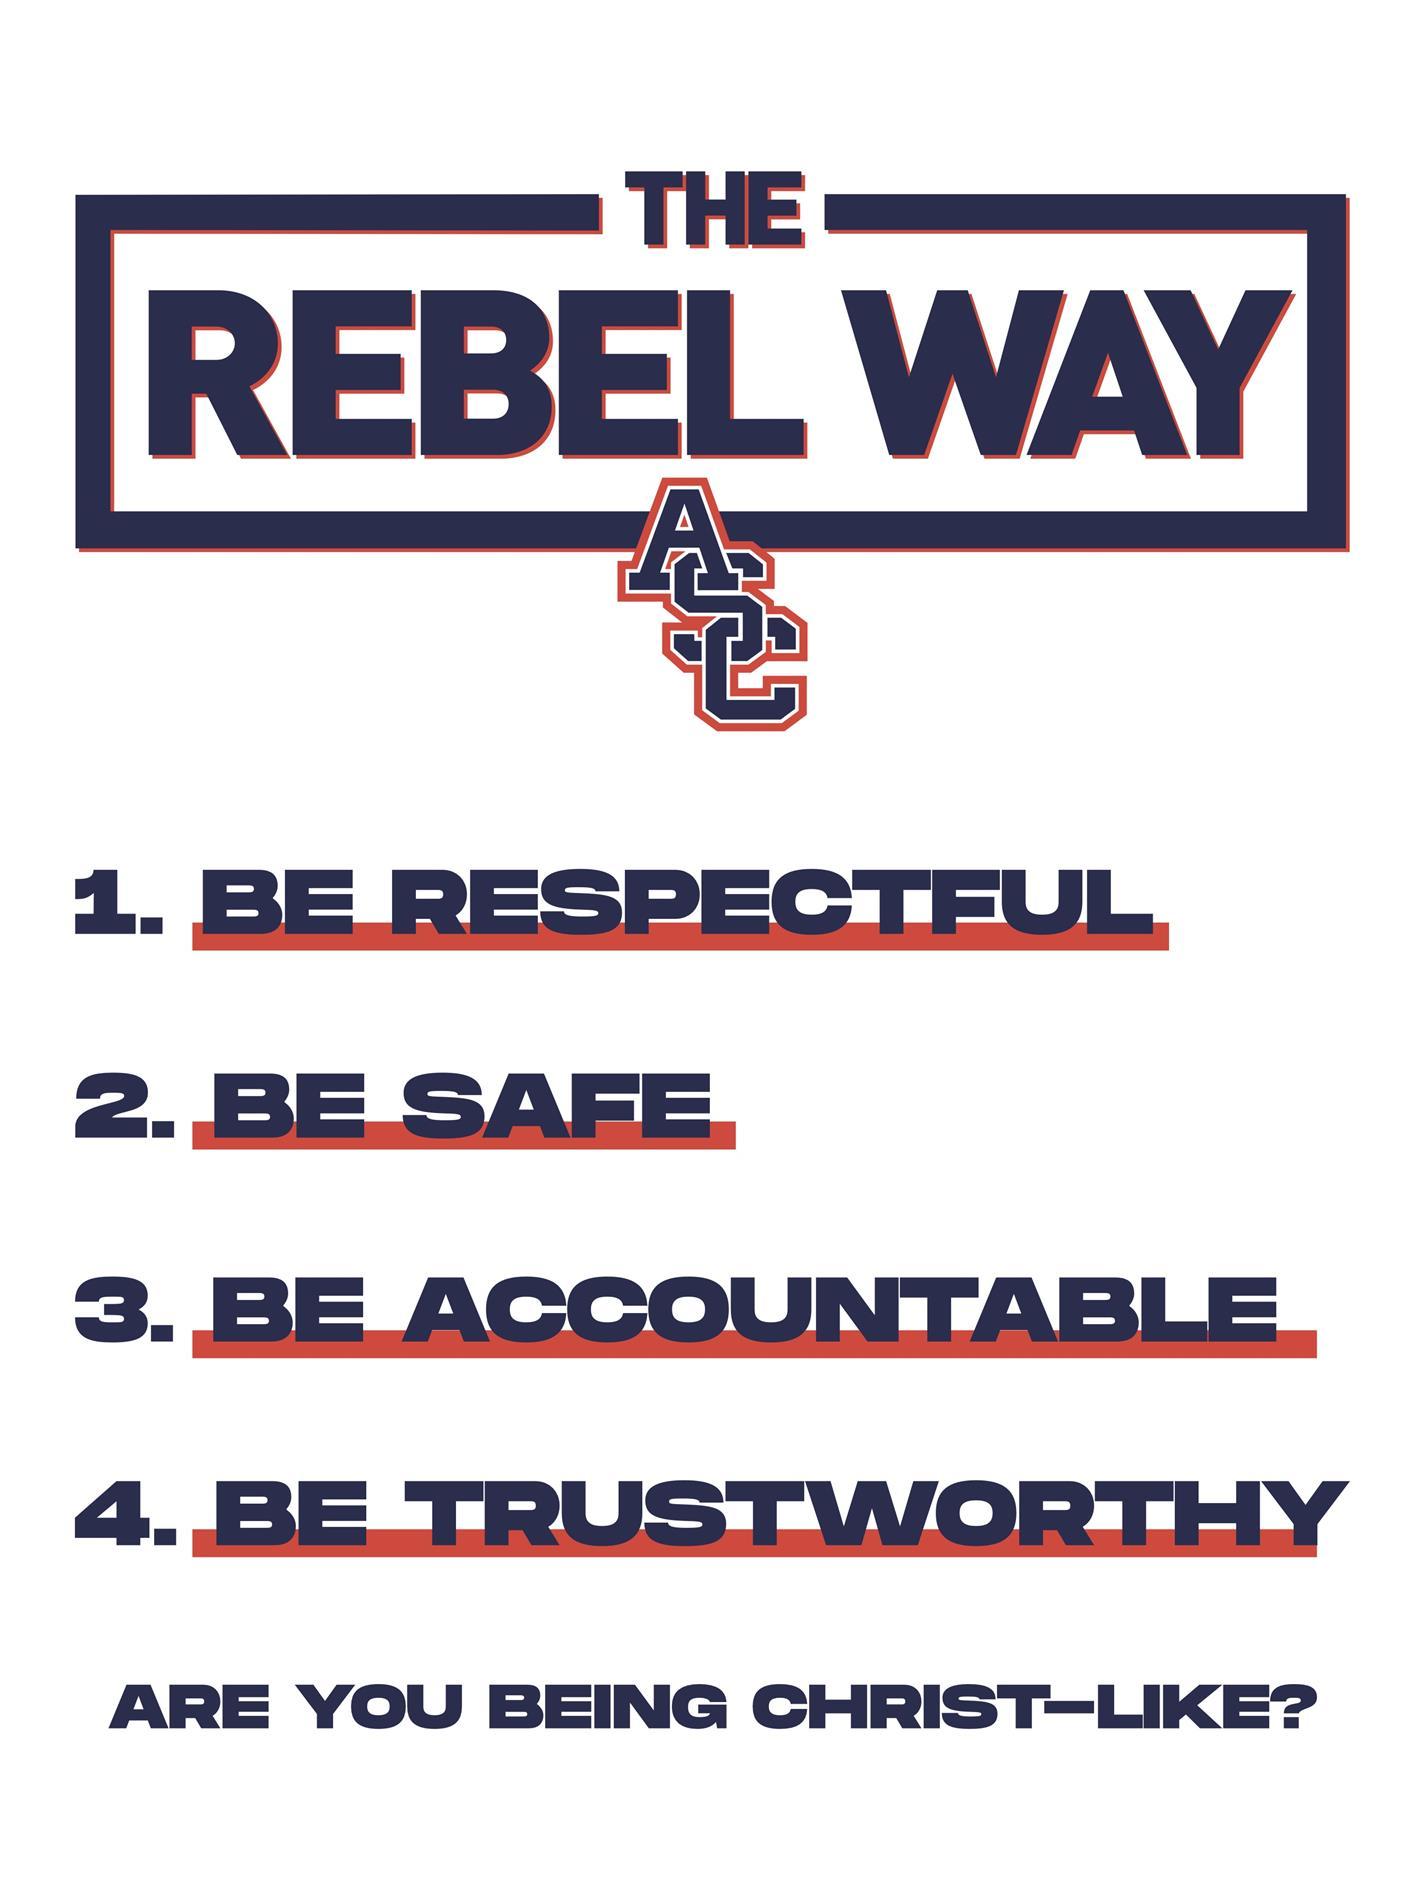 The Rebel Way